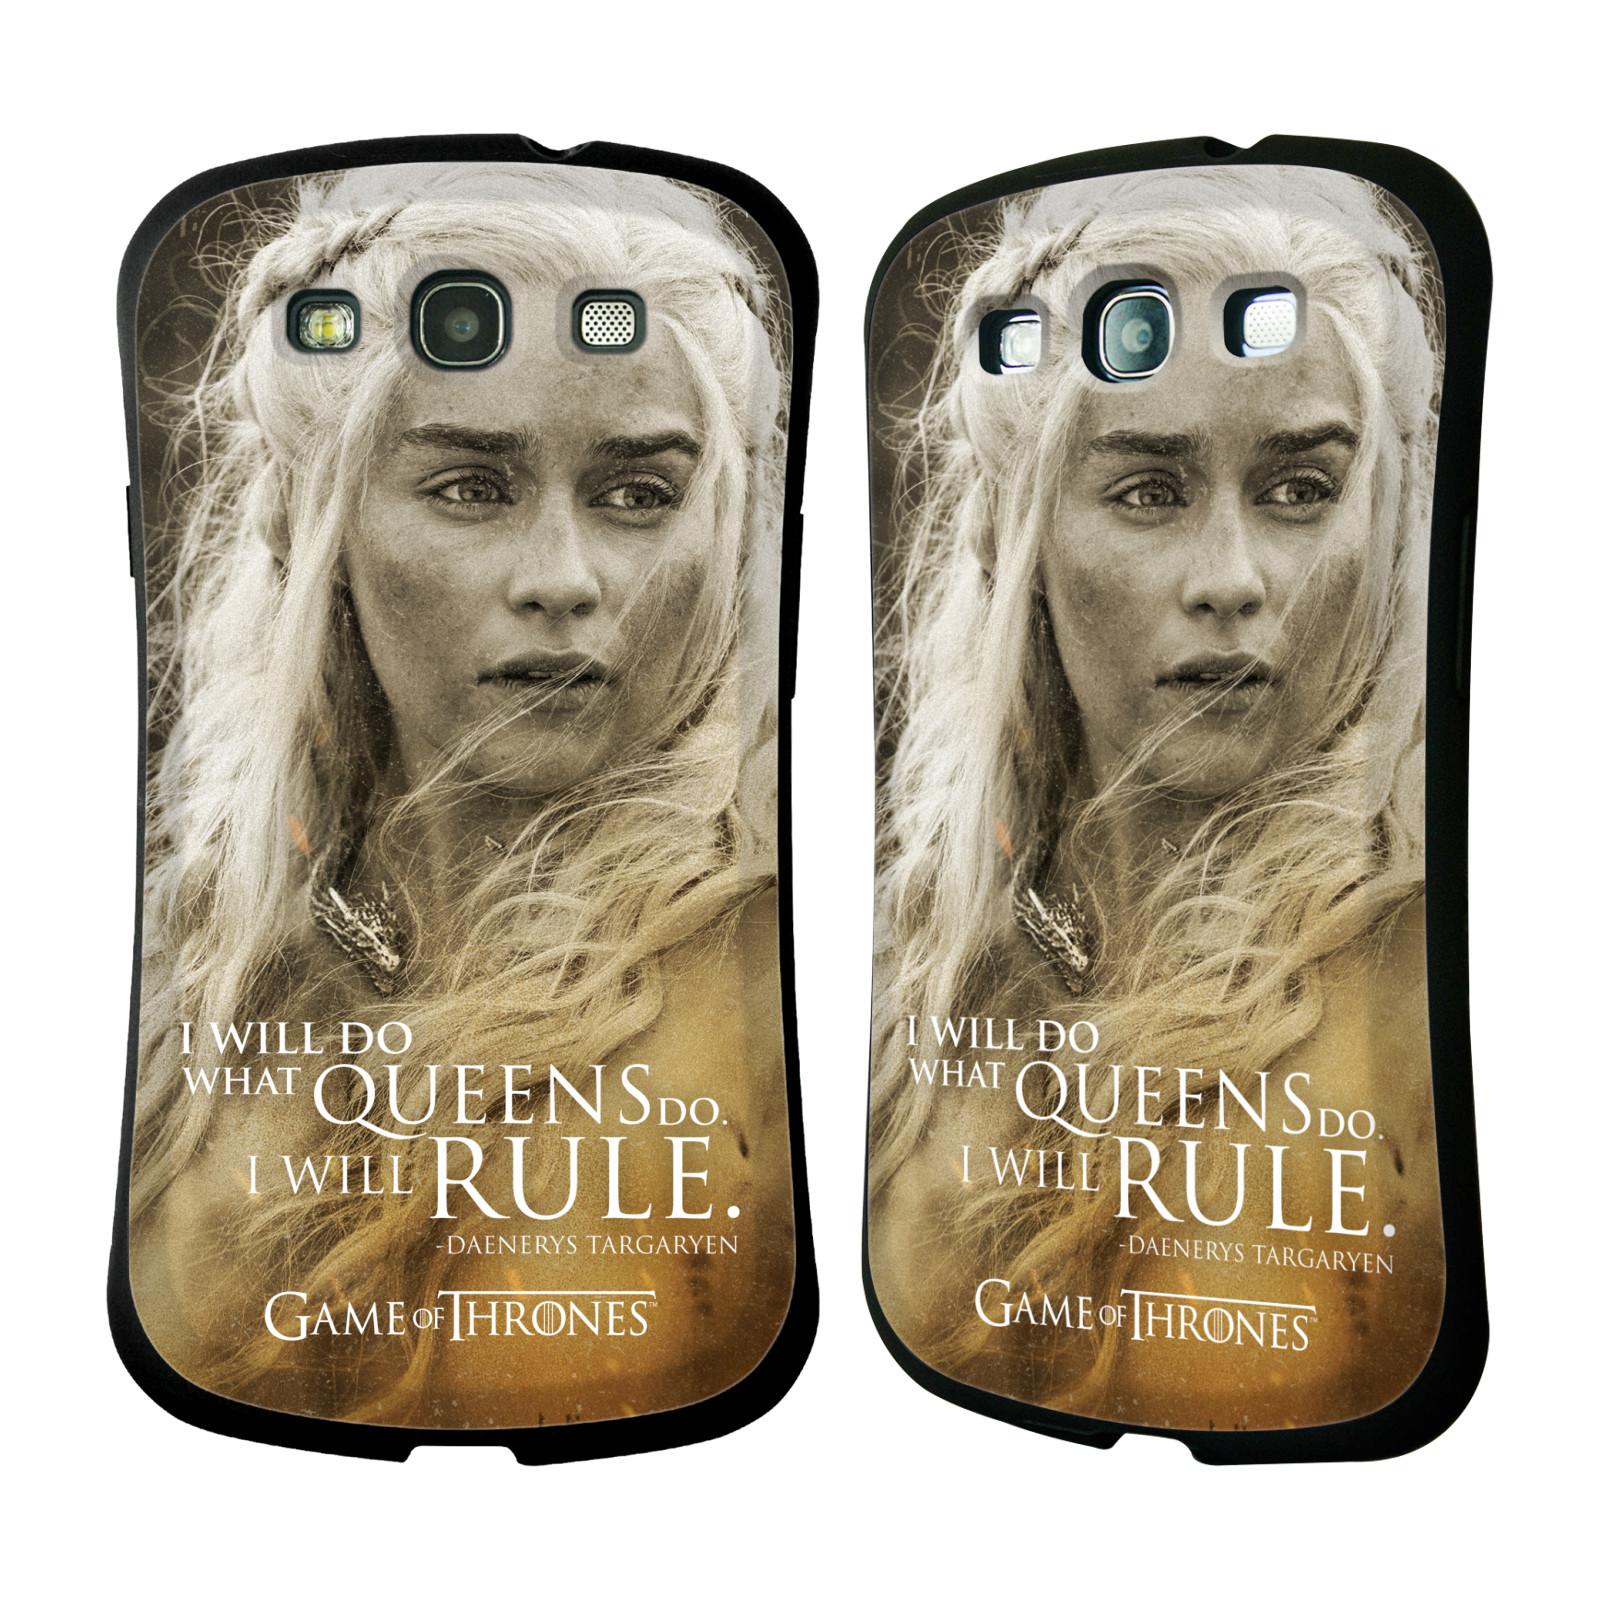 HEAD CASE silikon/plast odolný obal na mobil Samsung Galaxy S3 i9300 / S3 NEO Hra o trůny postava Daenerys Targaryen matka draků